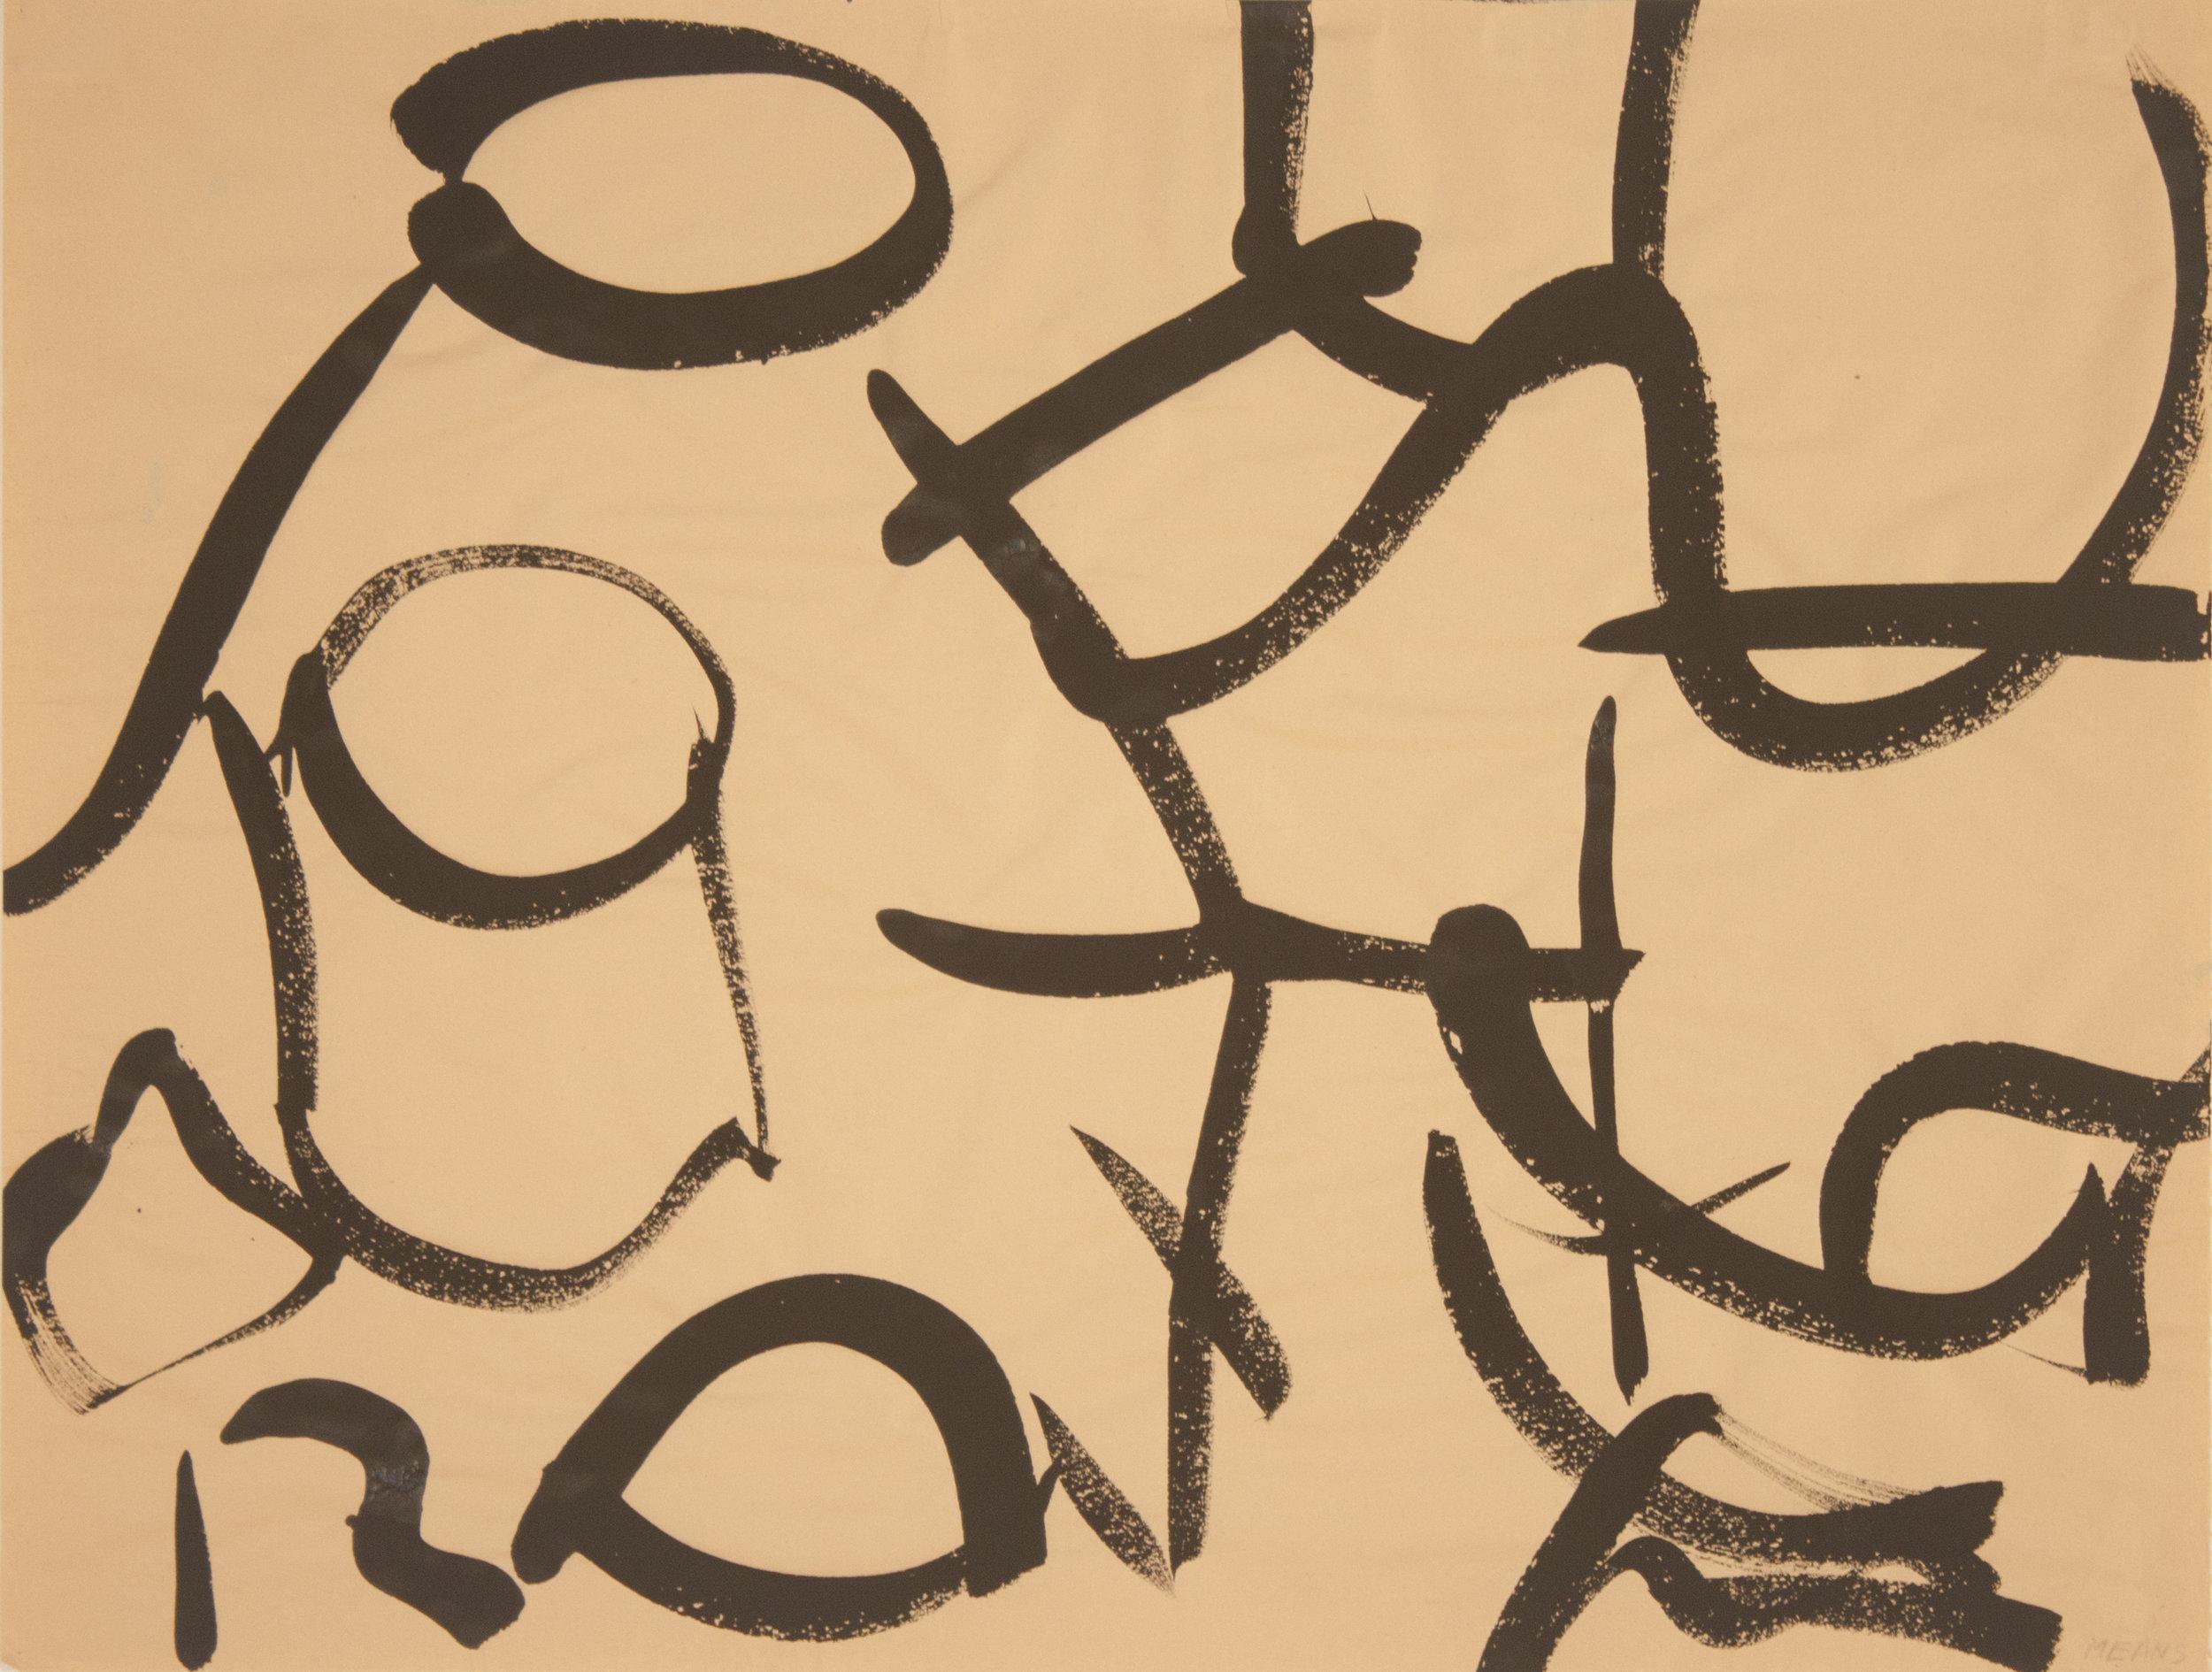 Brush Drawing 1, 1979